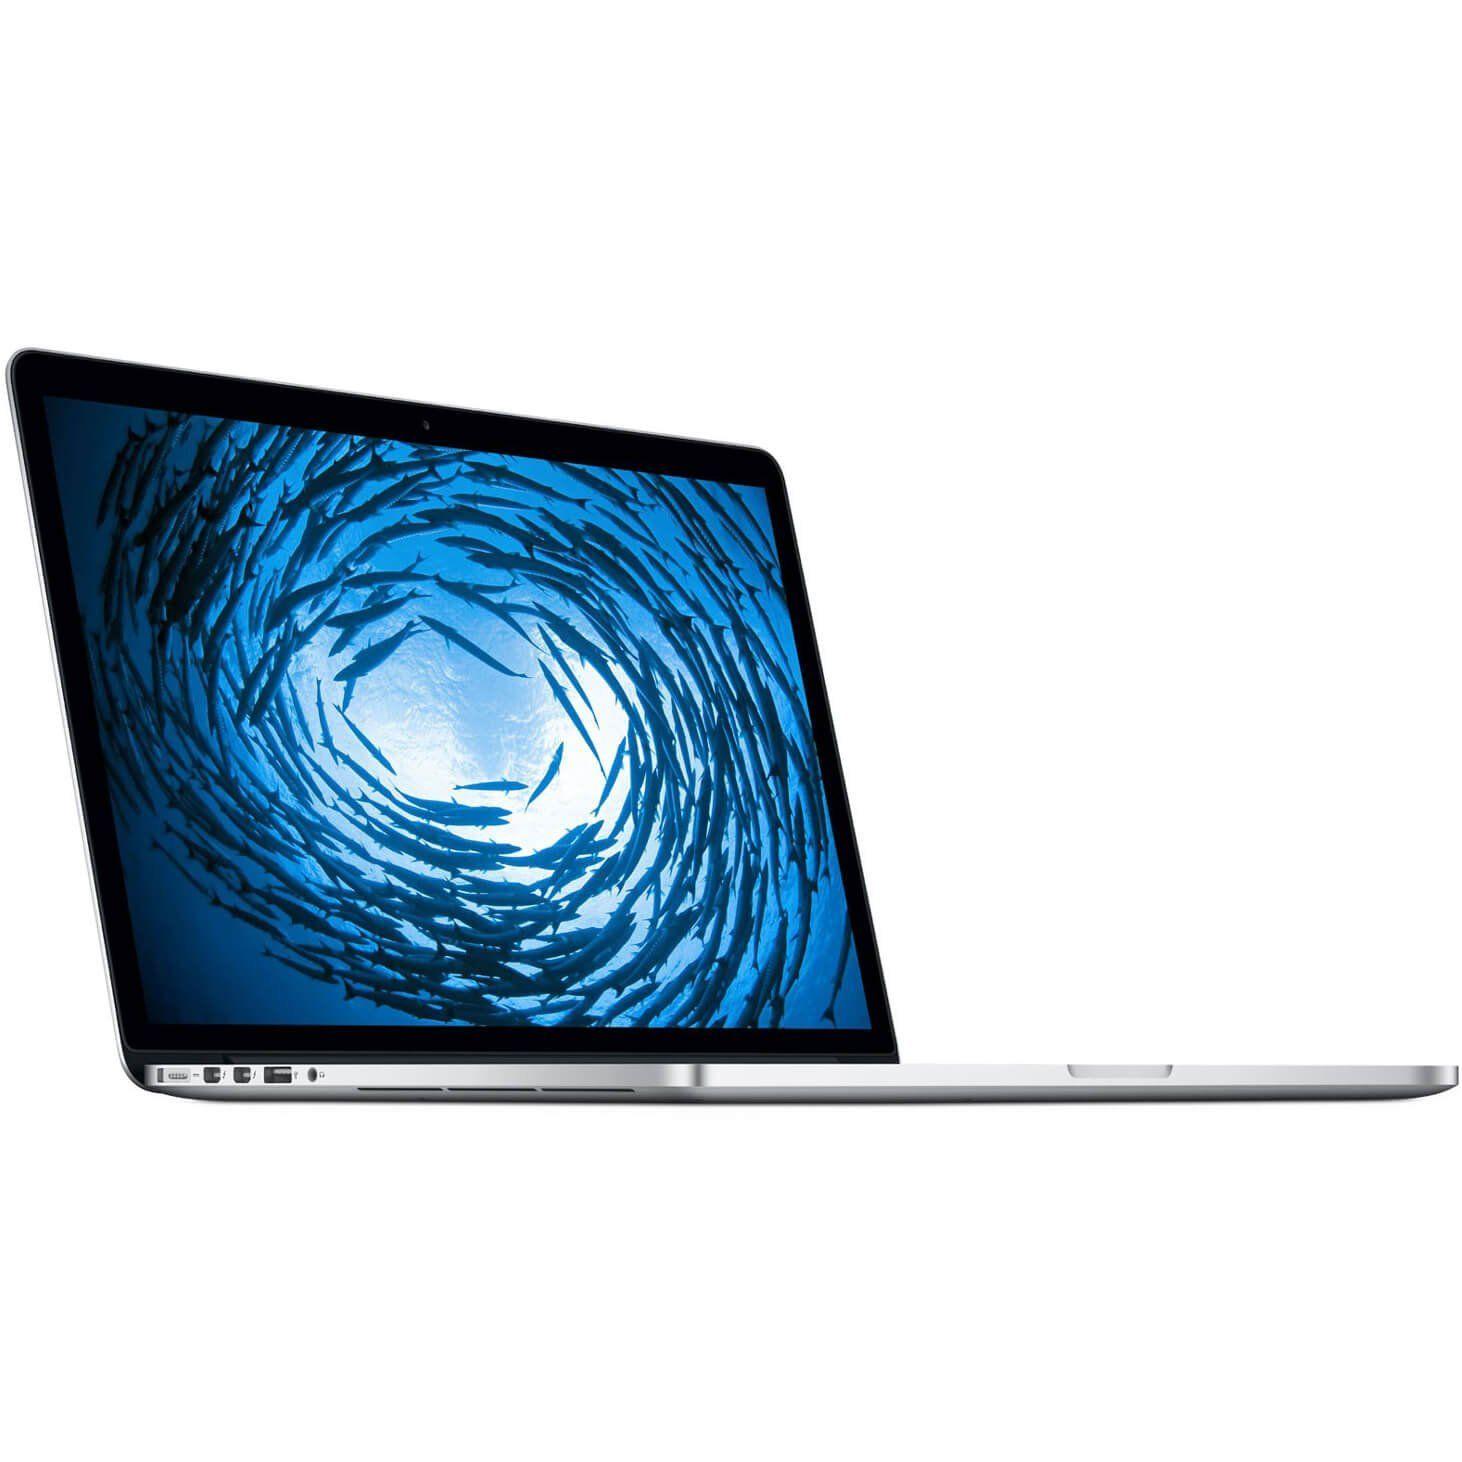 Apple MacBook Pro Retina Core i74770HQ Apple macbook